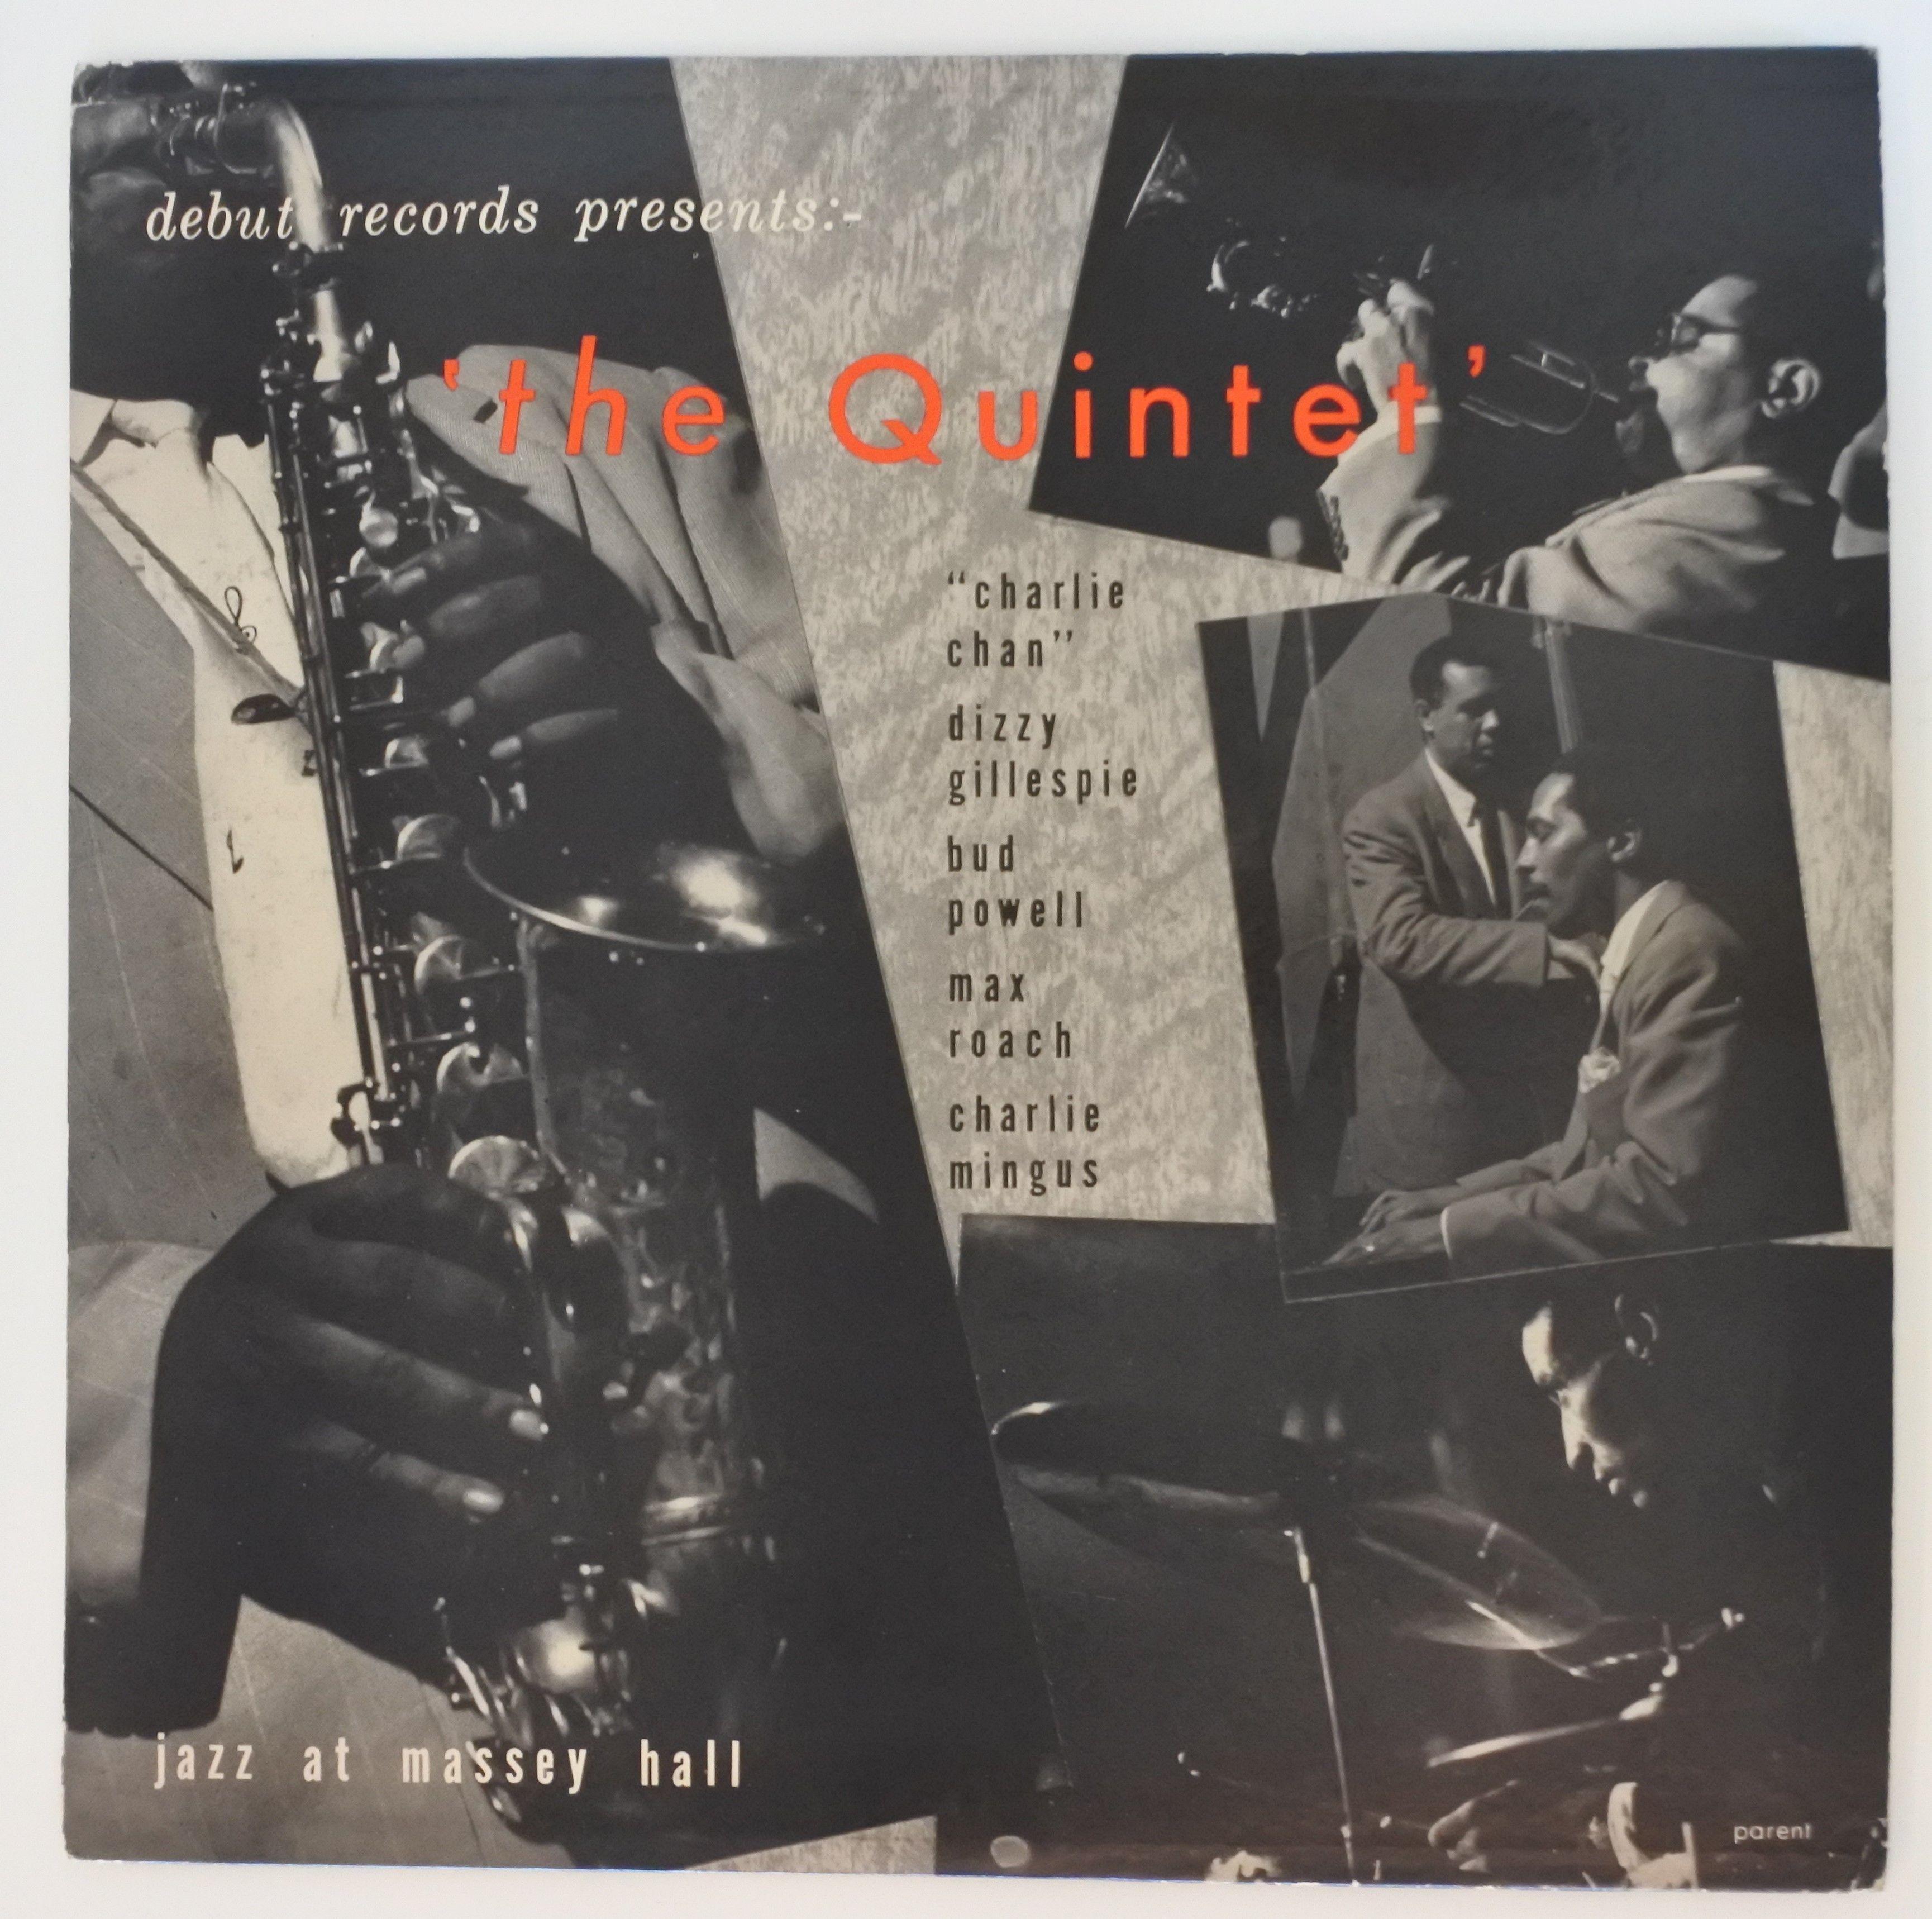 The Quintet ?- Jazz At Massey Hall(Debut Records ?- DEB-124)mono